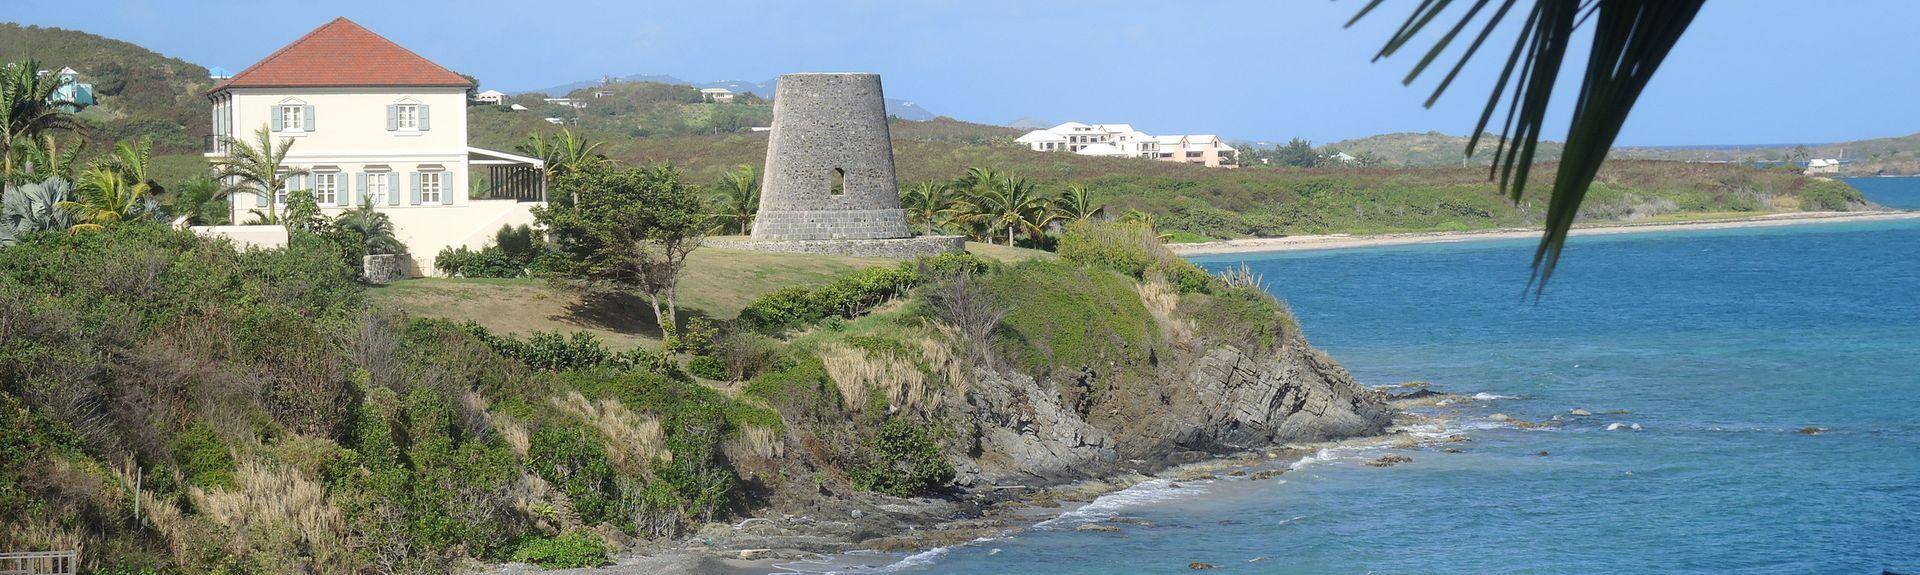 Golfclub Carambola, Kingshill, St. Croix Island, Amerikaanse Maagdeneilanden